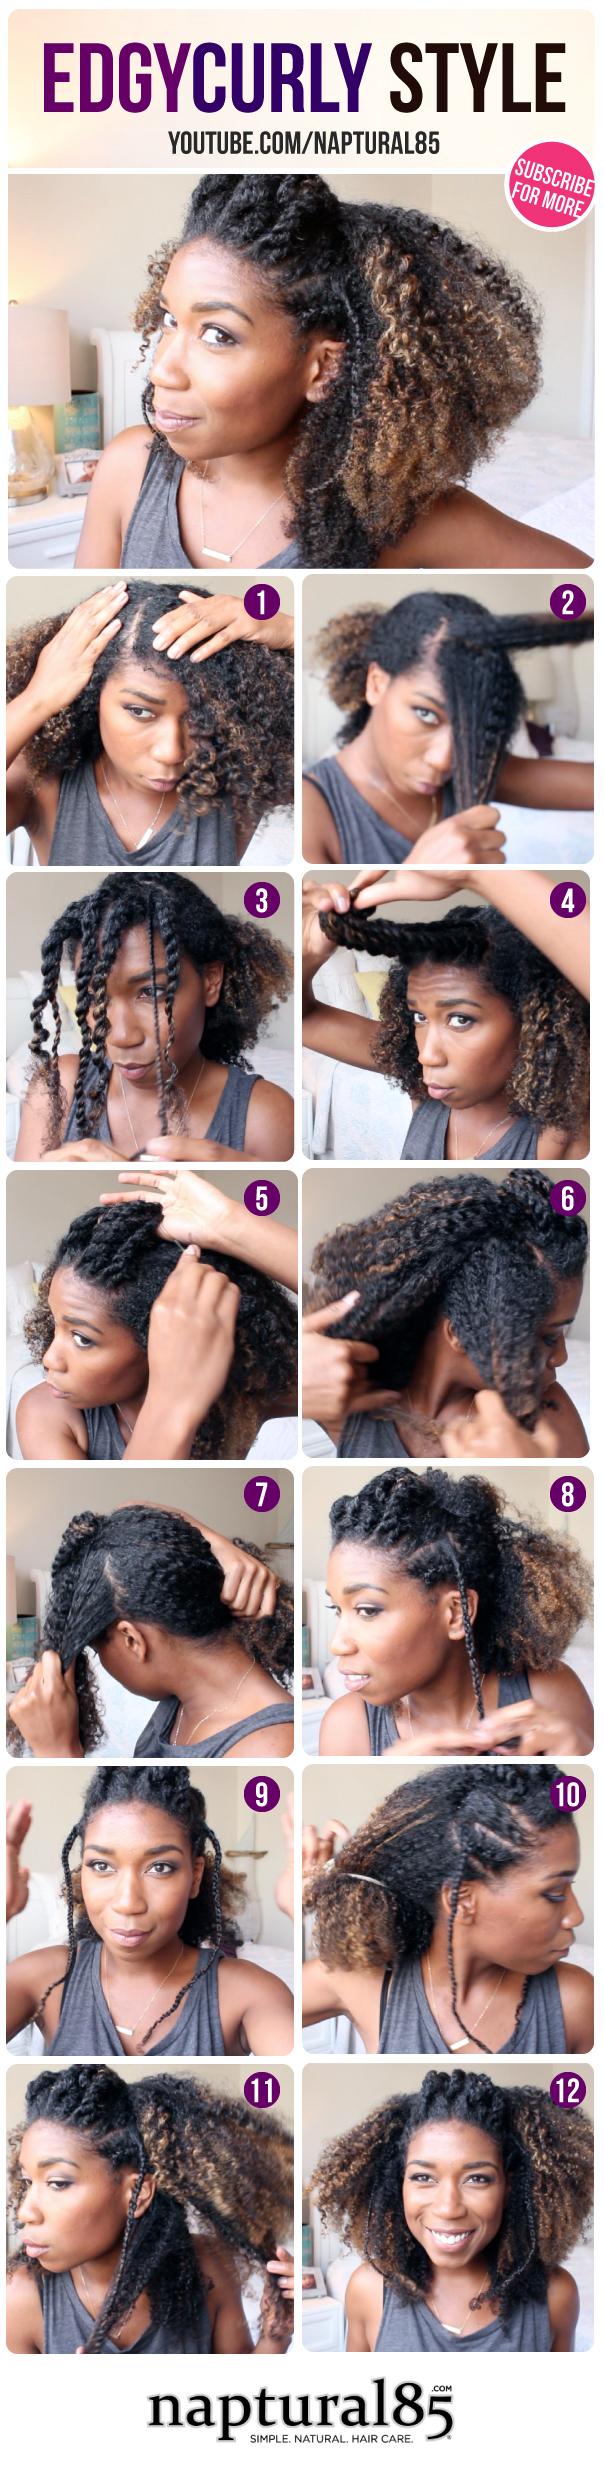 best+party+hair+tutorials  - Cosmopolitan.co.uk